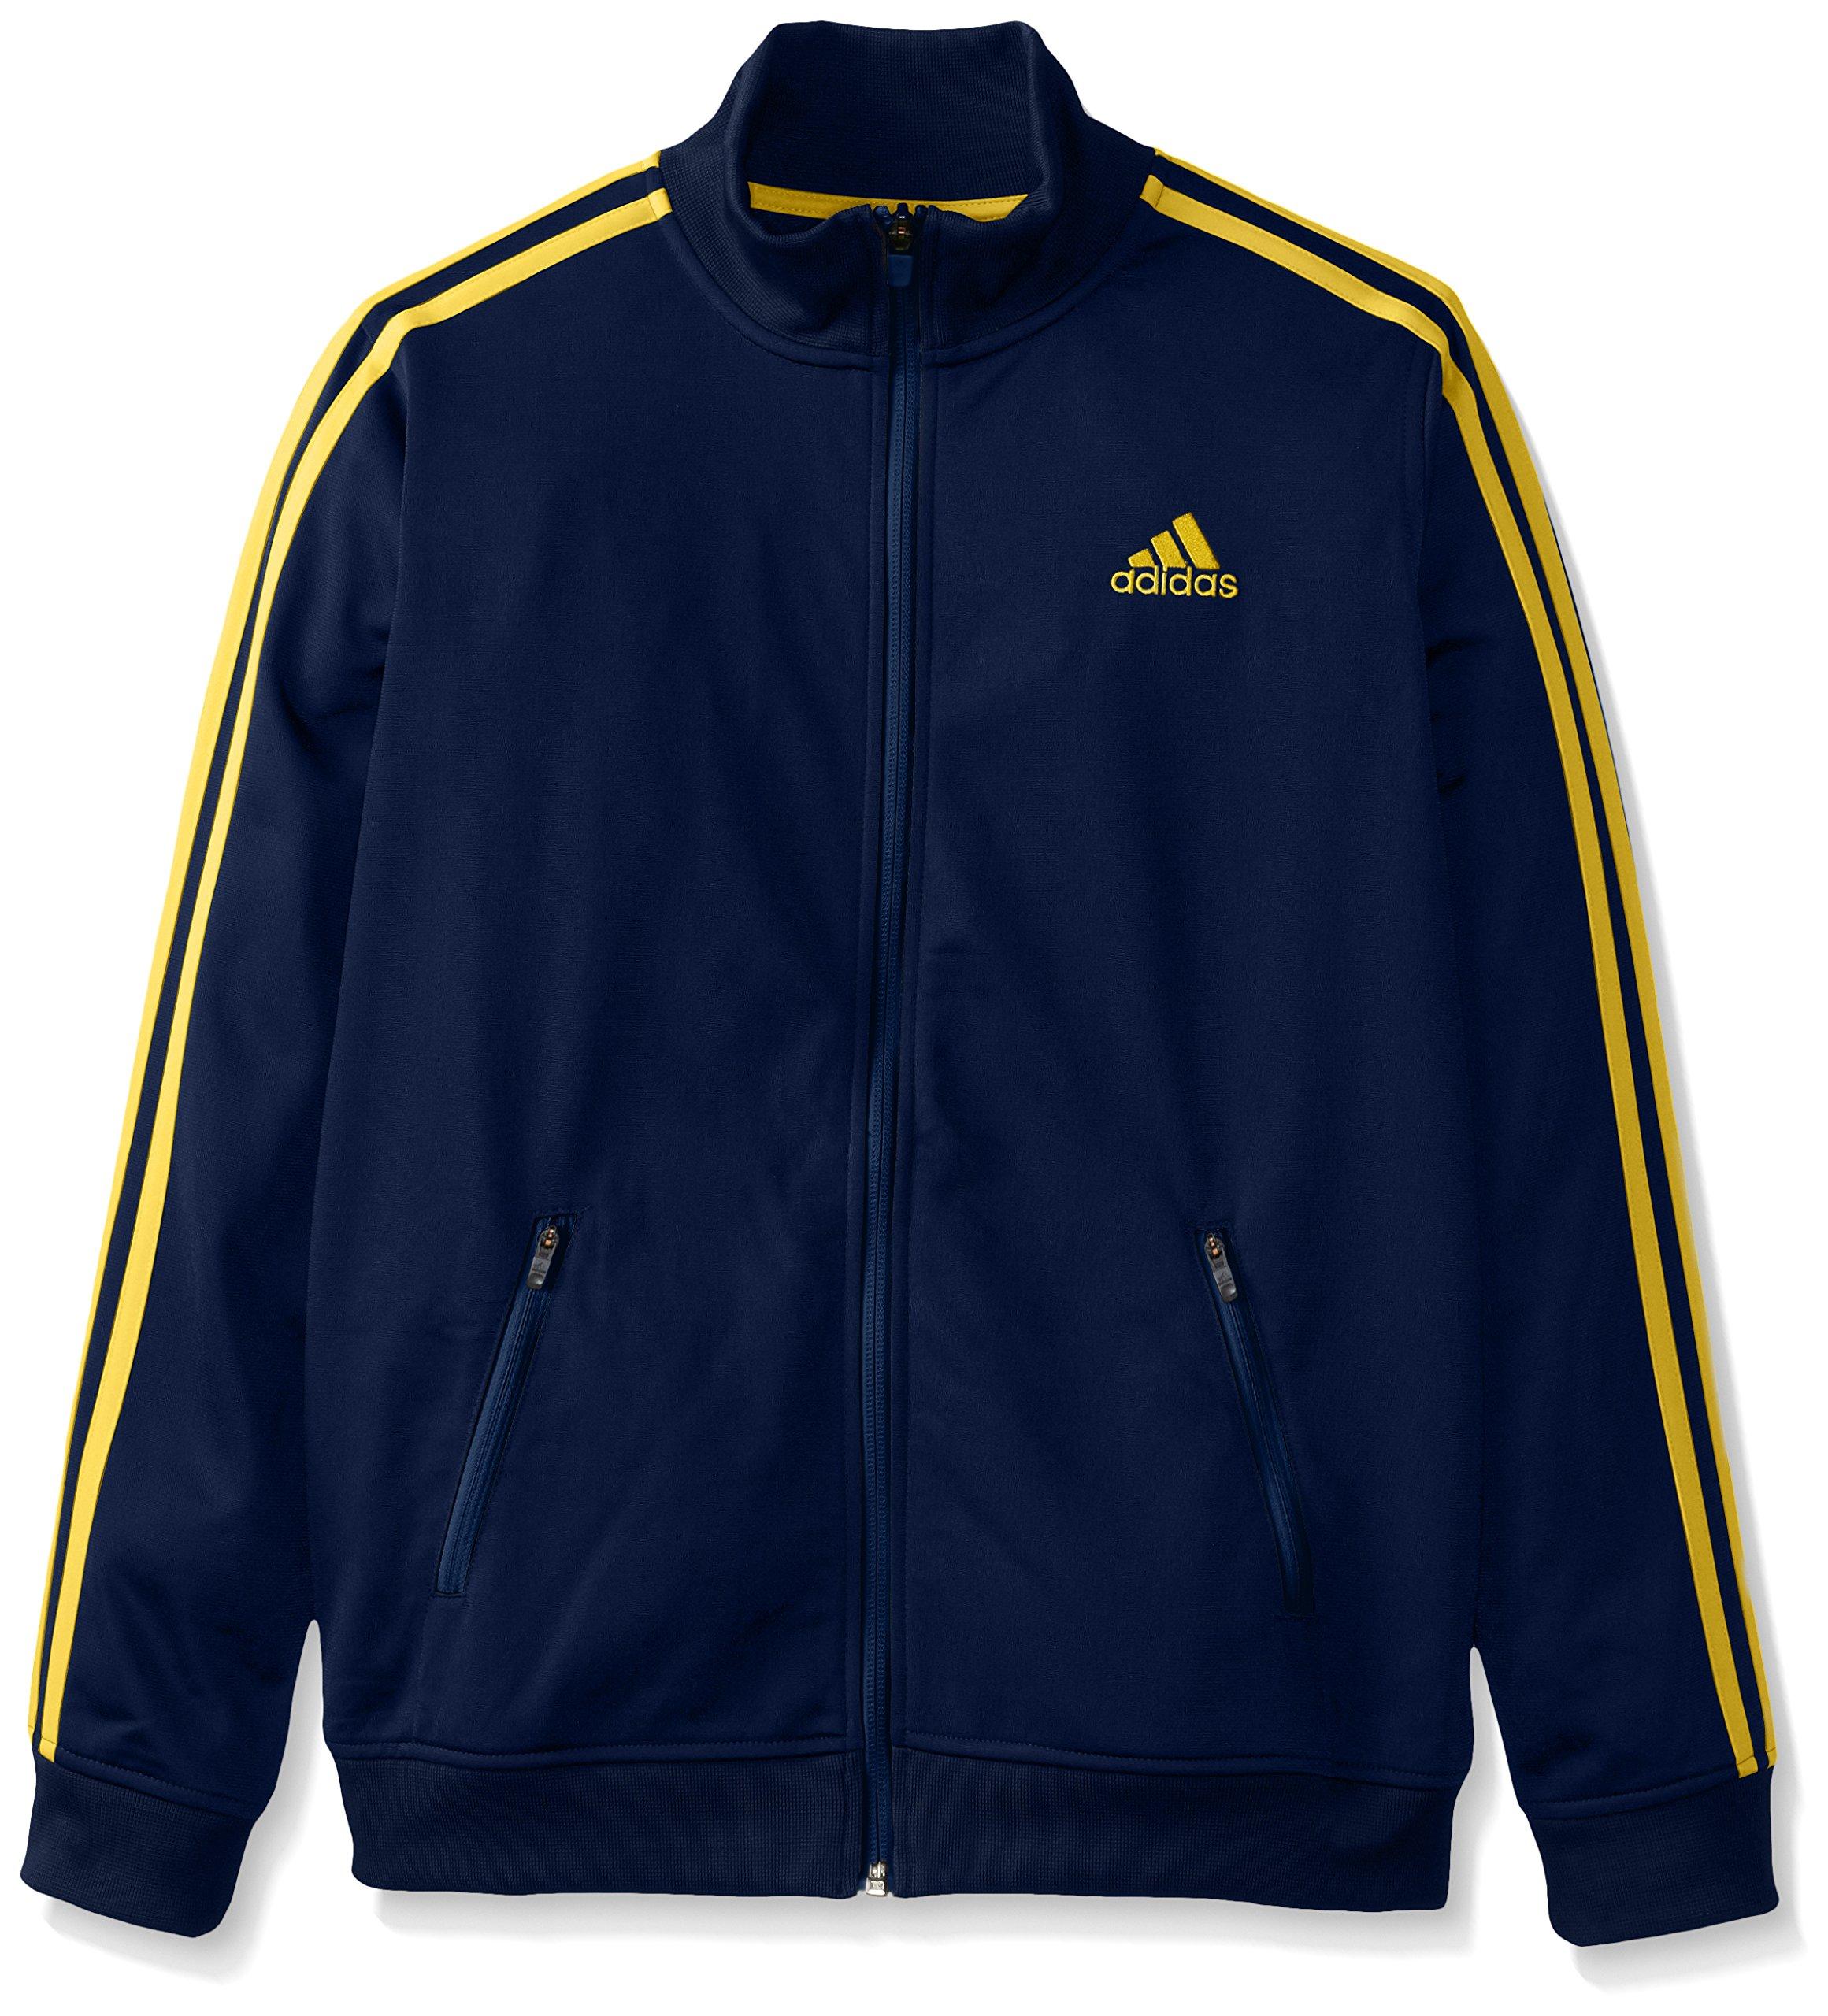 adidas Big Boys' Separates Training Track Jacket, Navy/Yellow, Small/8